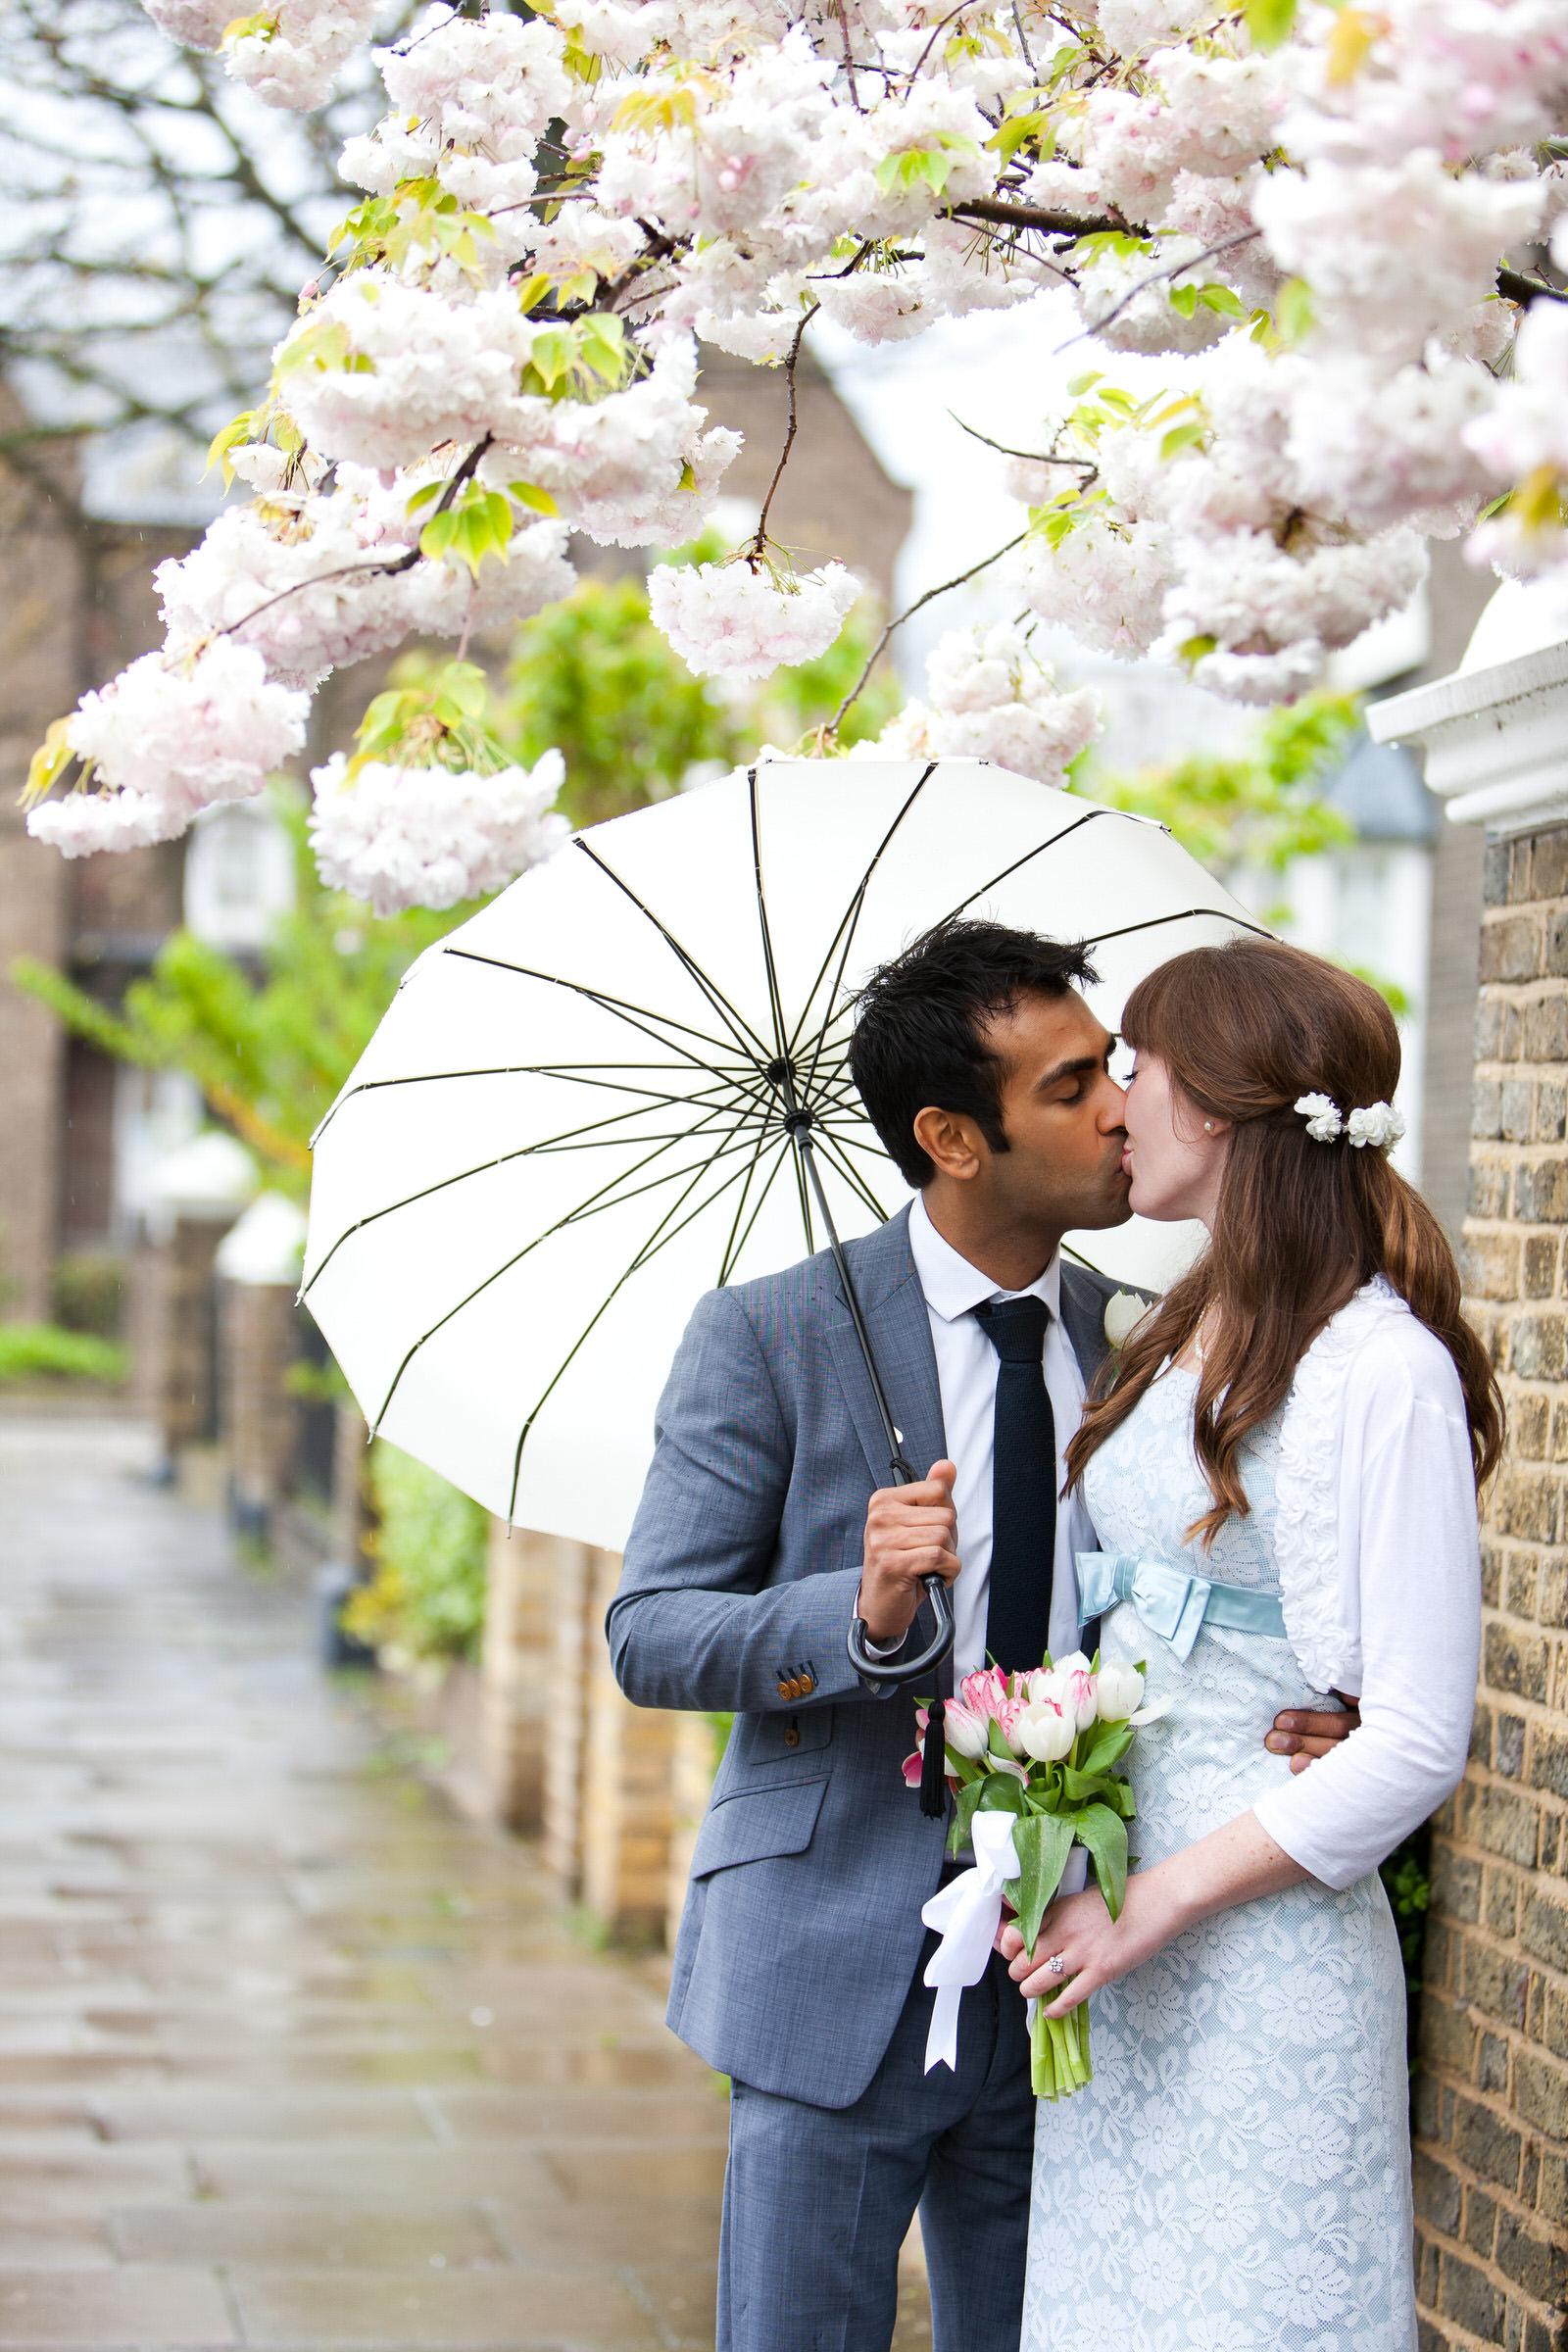 Wedding photography in Hackney London